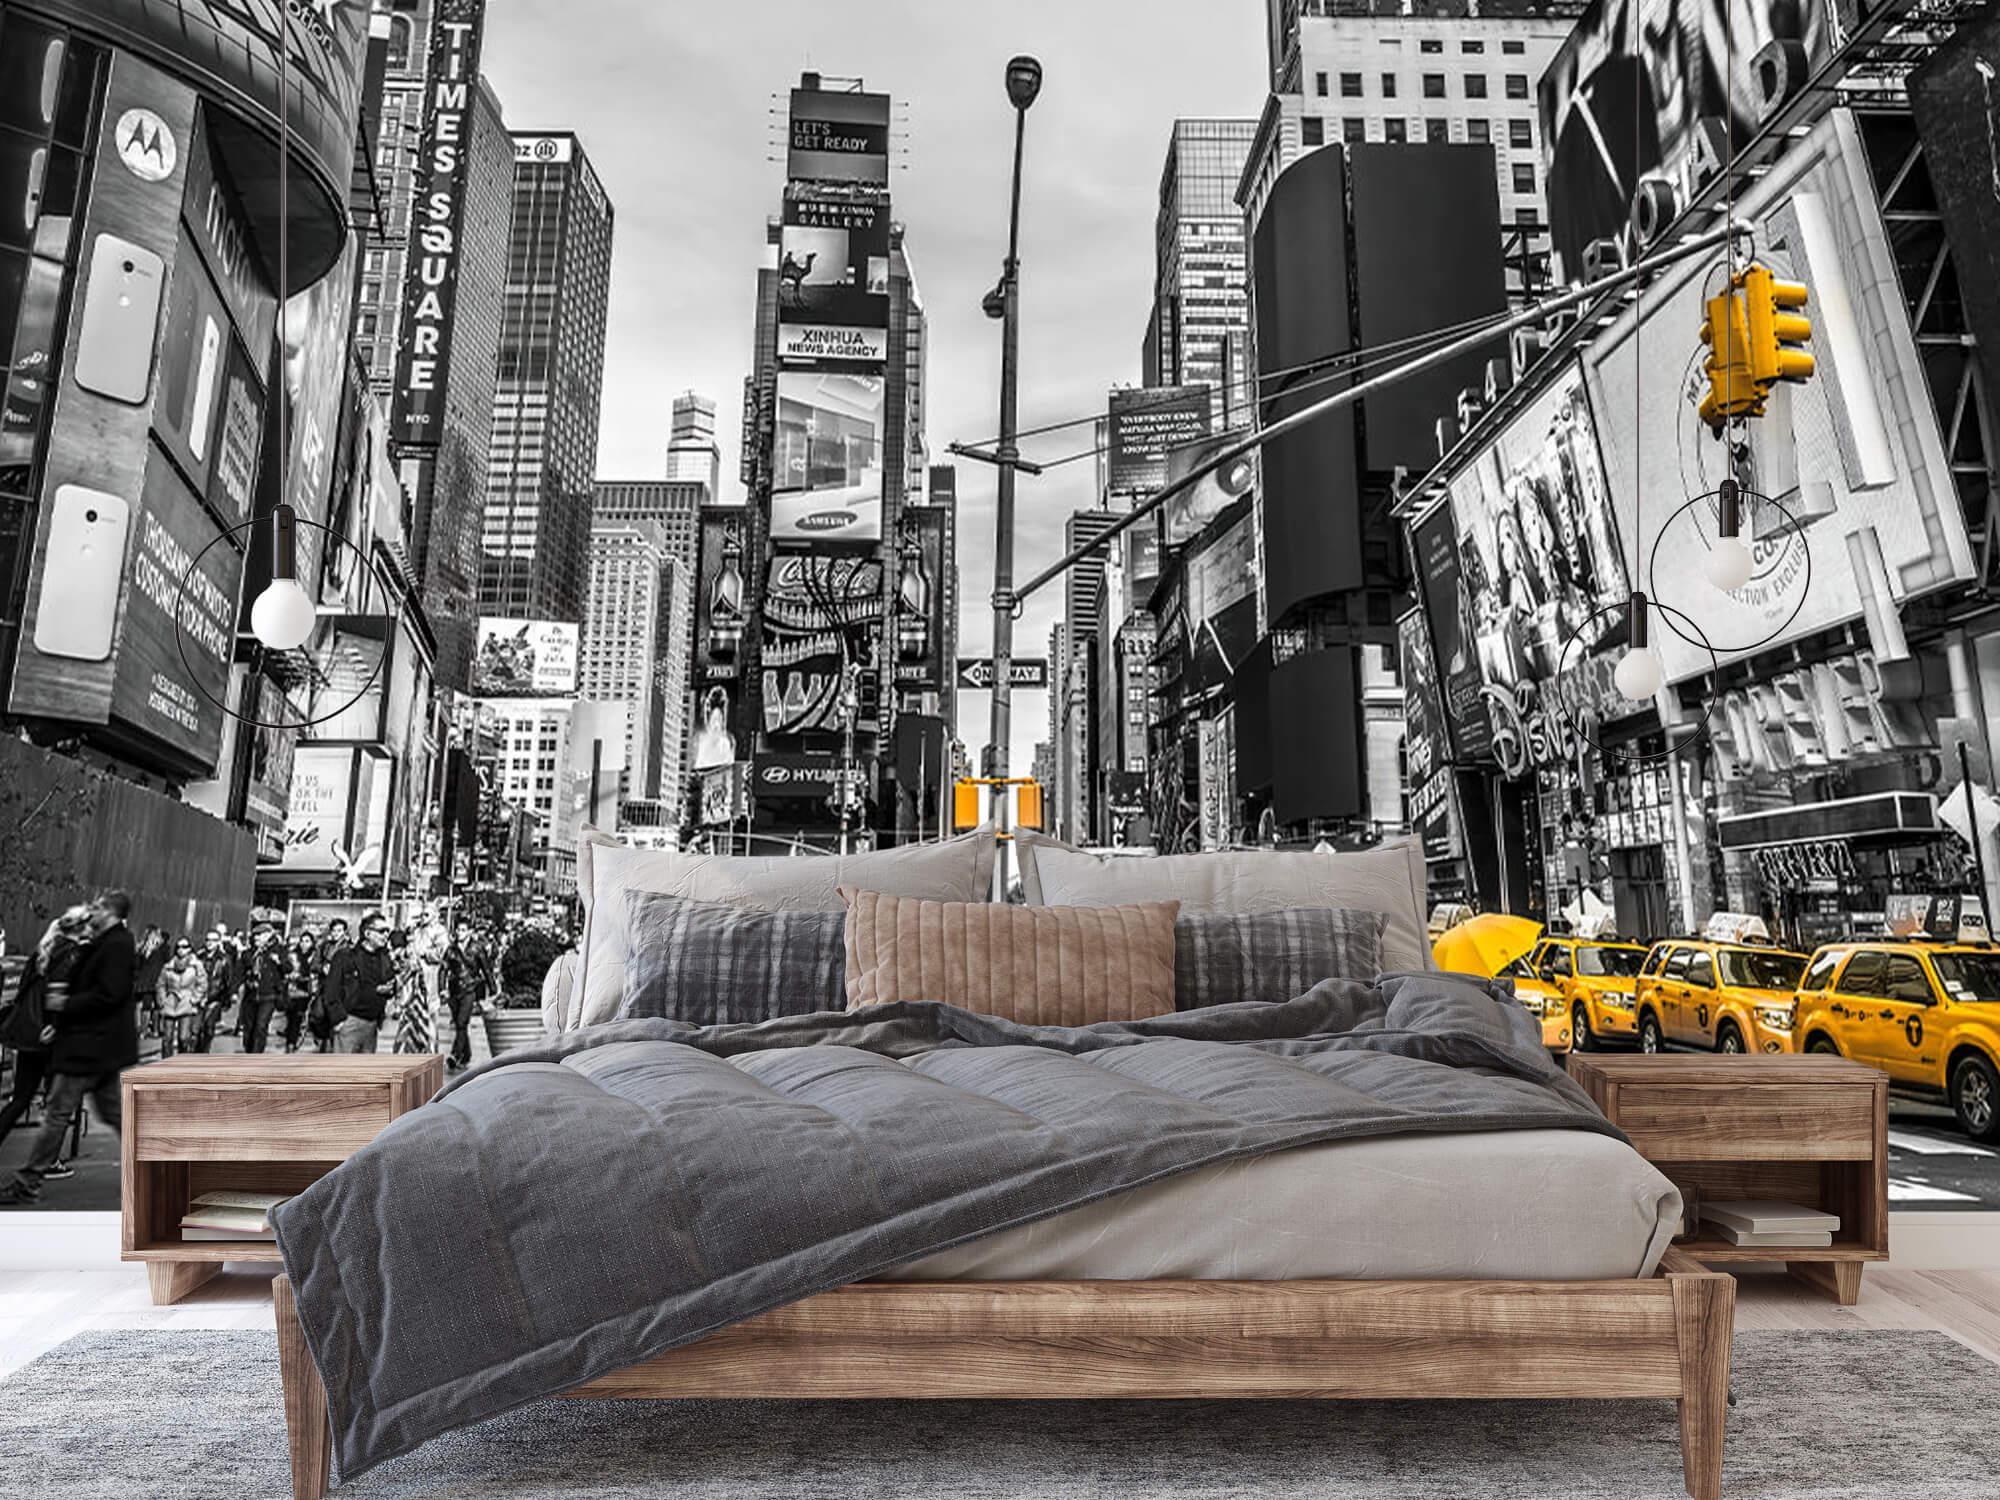 Broadway Times Square 1